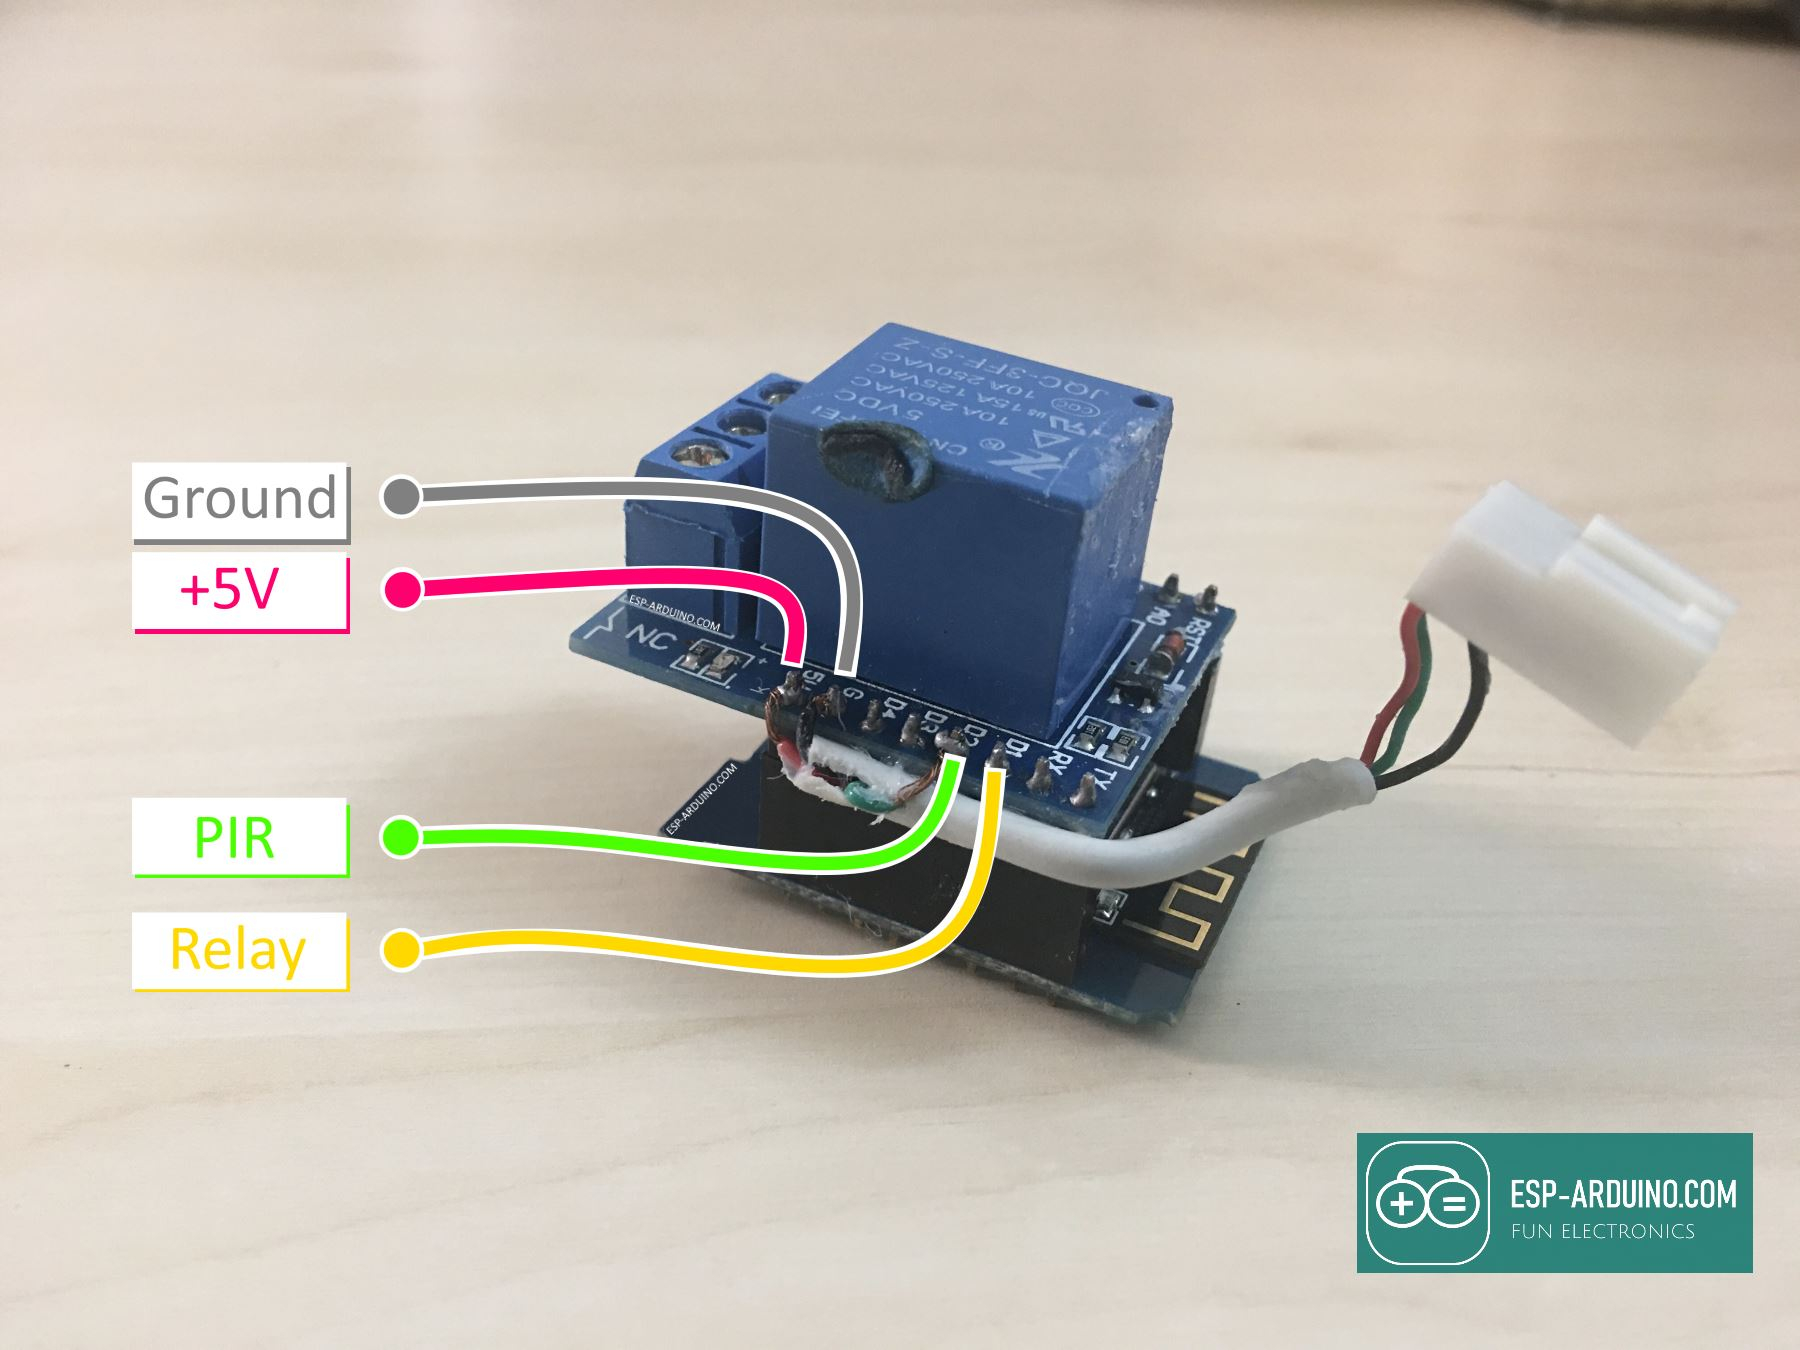 Wemos Relay module pins